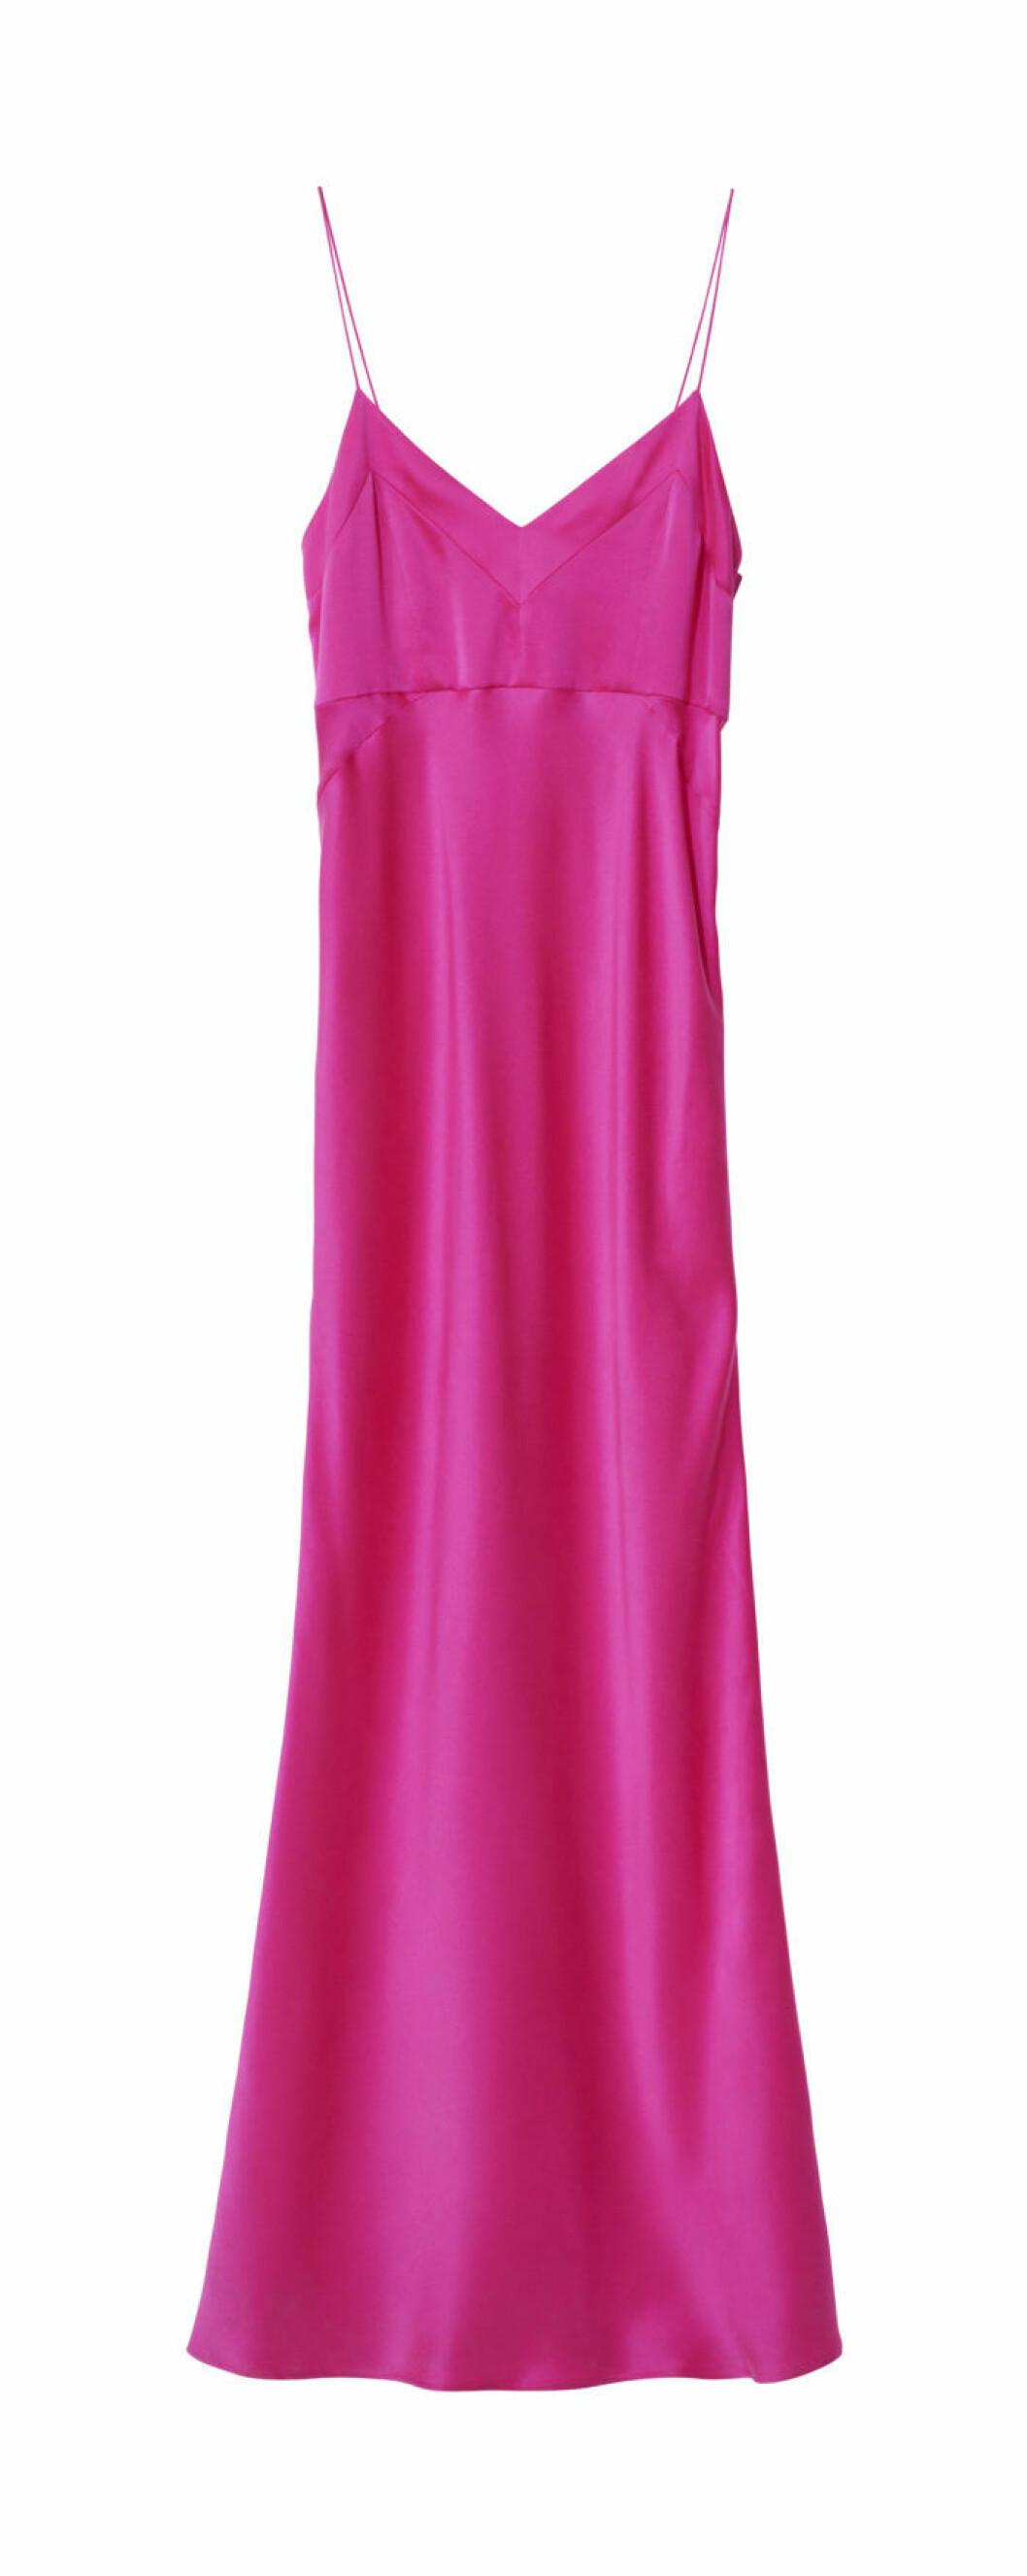 Rosa klänning h&m studio aw18